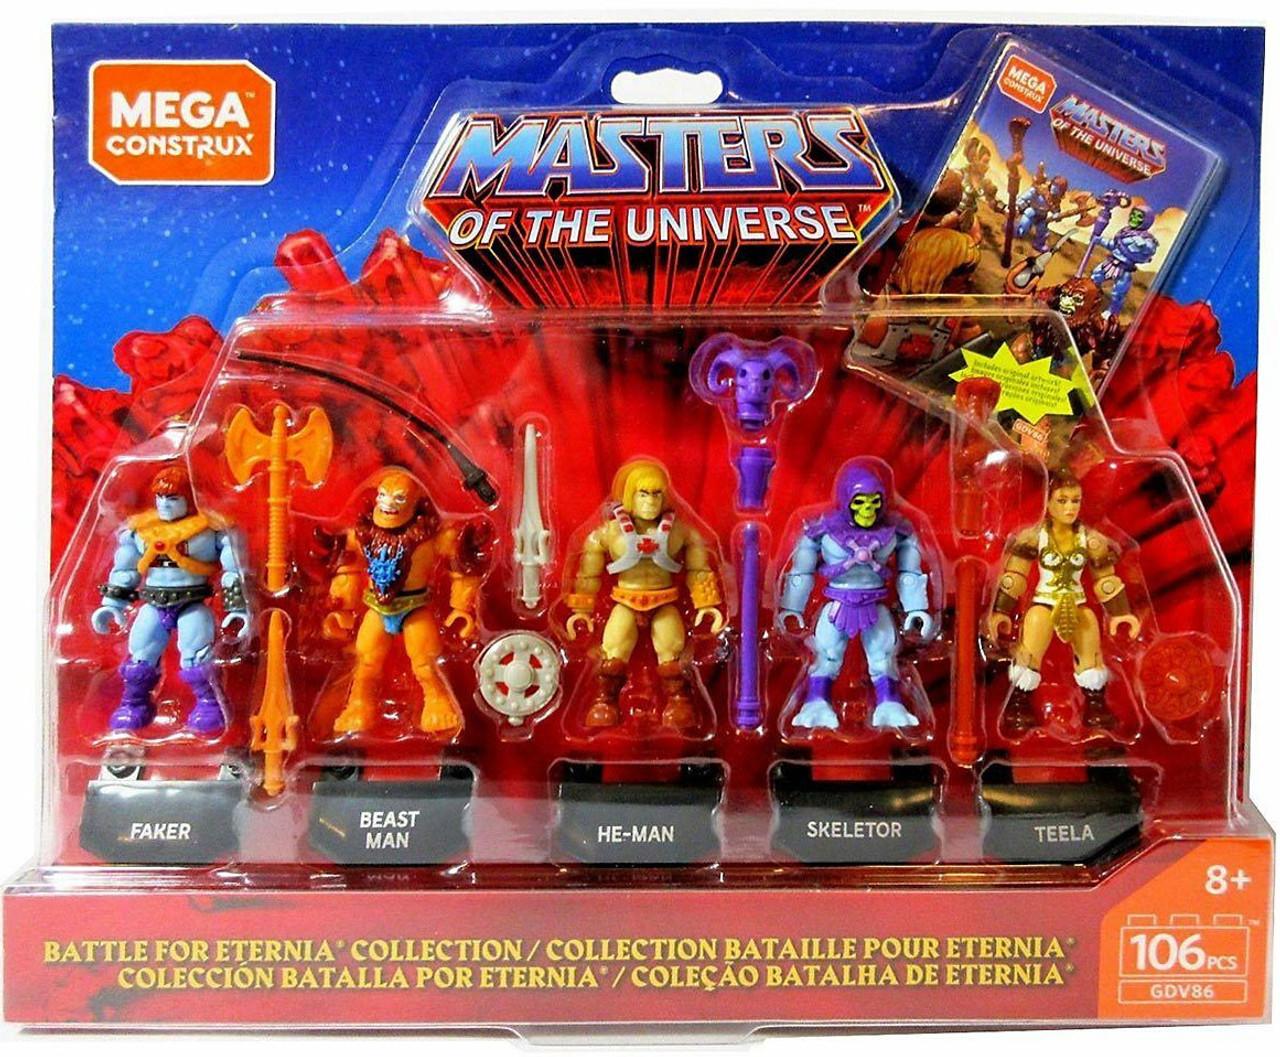 2 Masters of the Universe Beast Man Mega Construx Figure 22 pcs